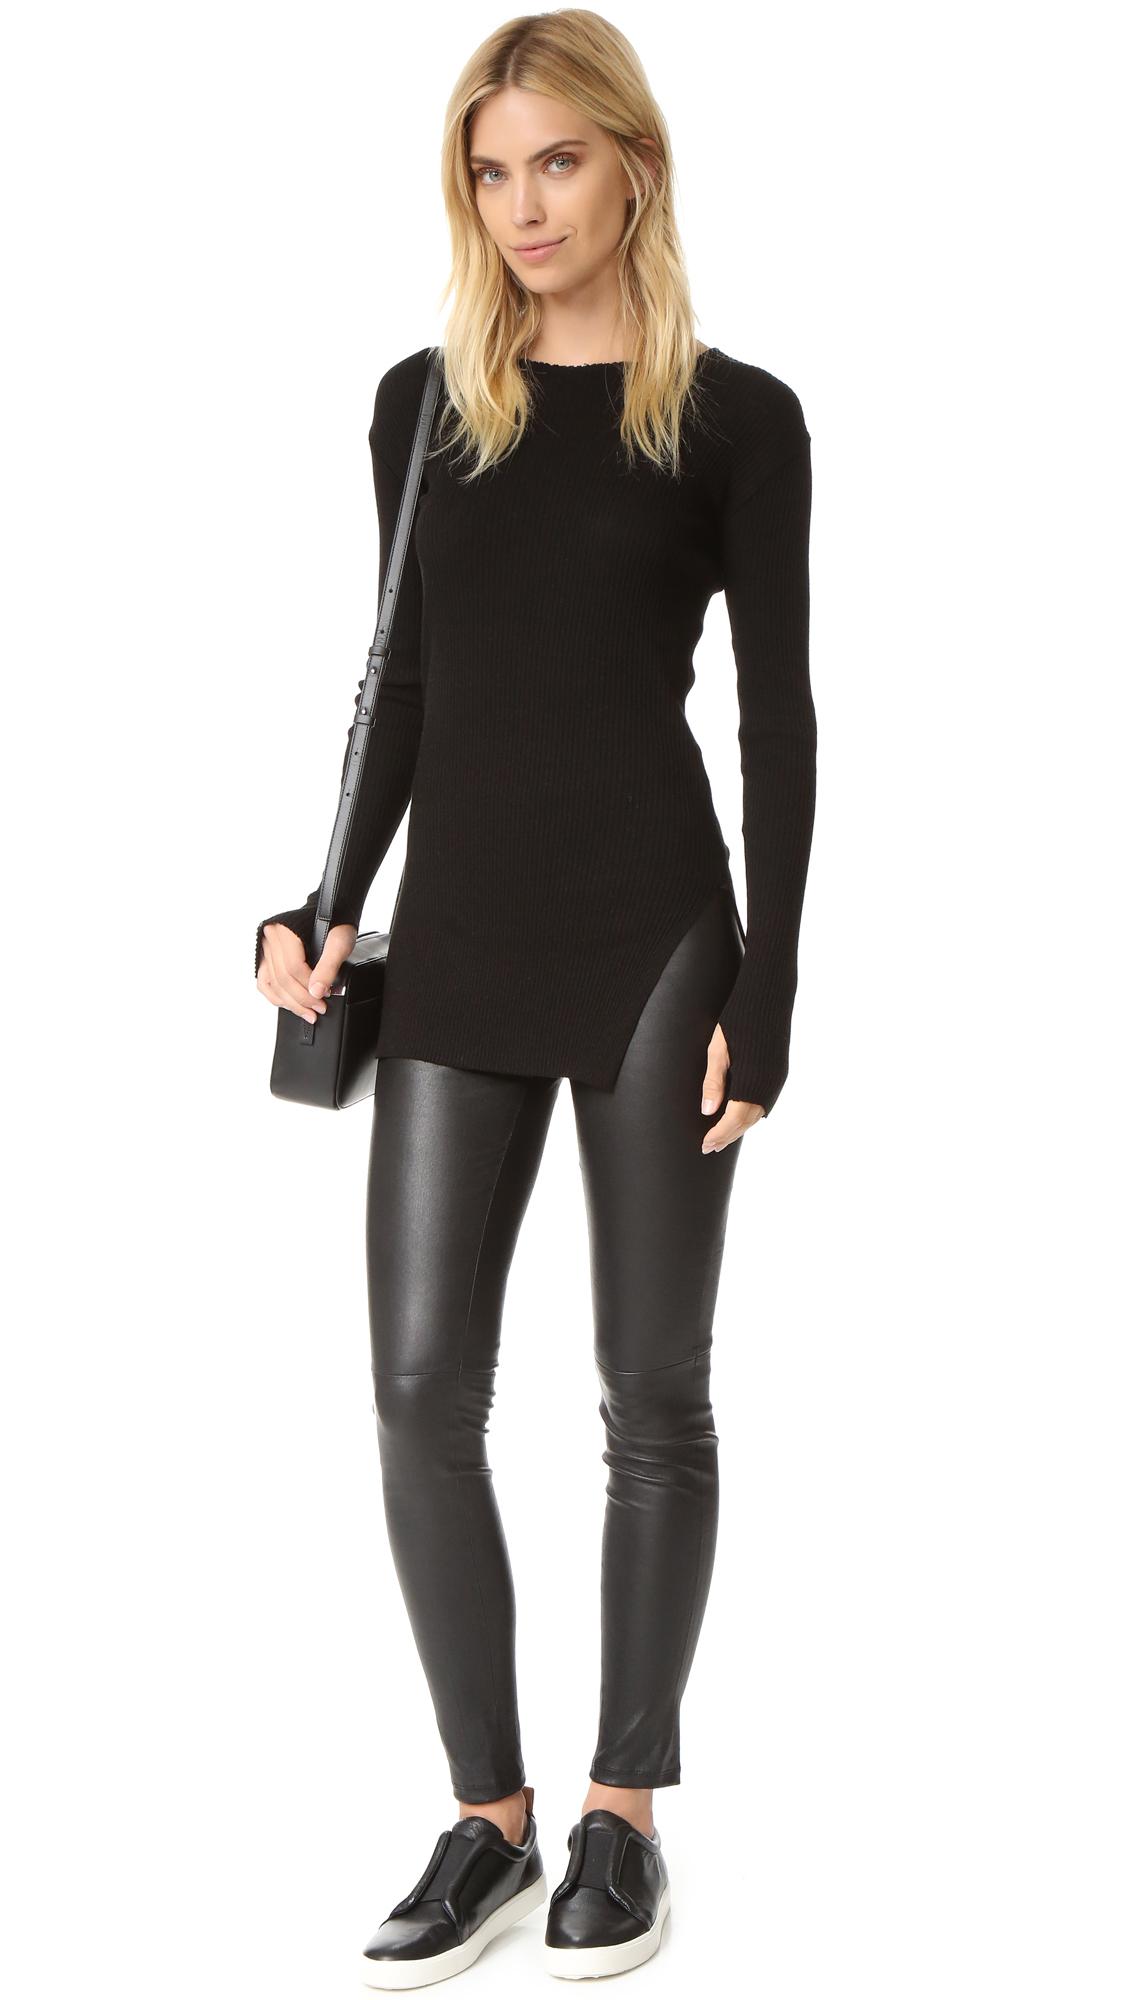 Lyst helmut lang raw edge long sleeve tee in black for Adam lippes women s long sleeve vee t shirt